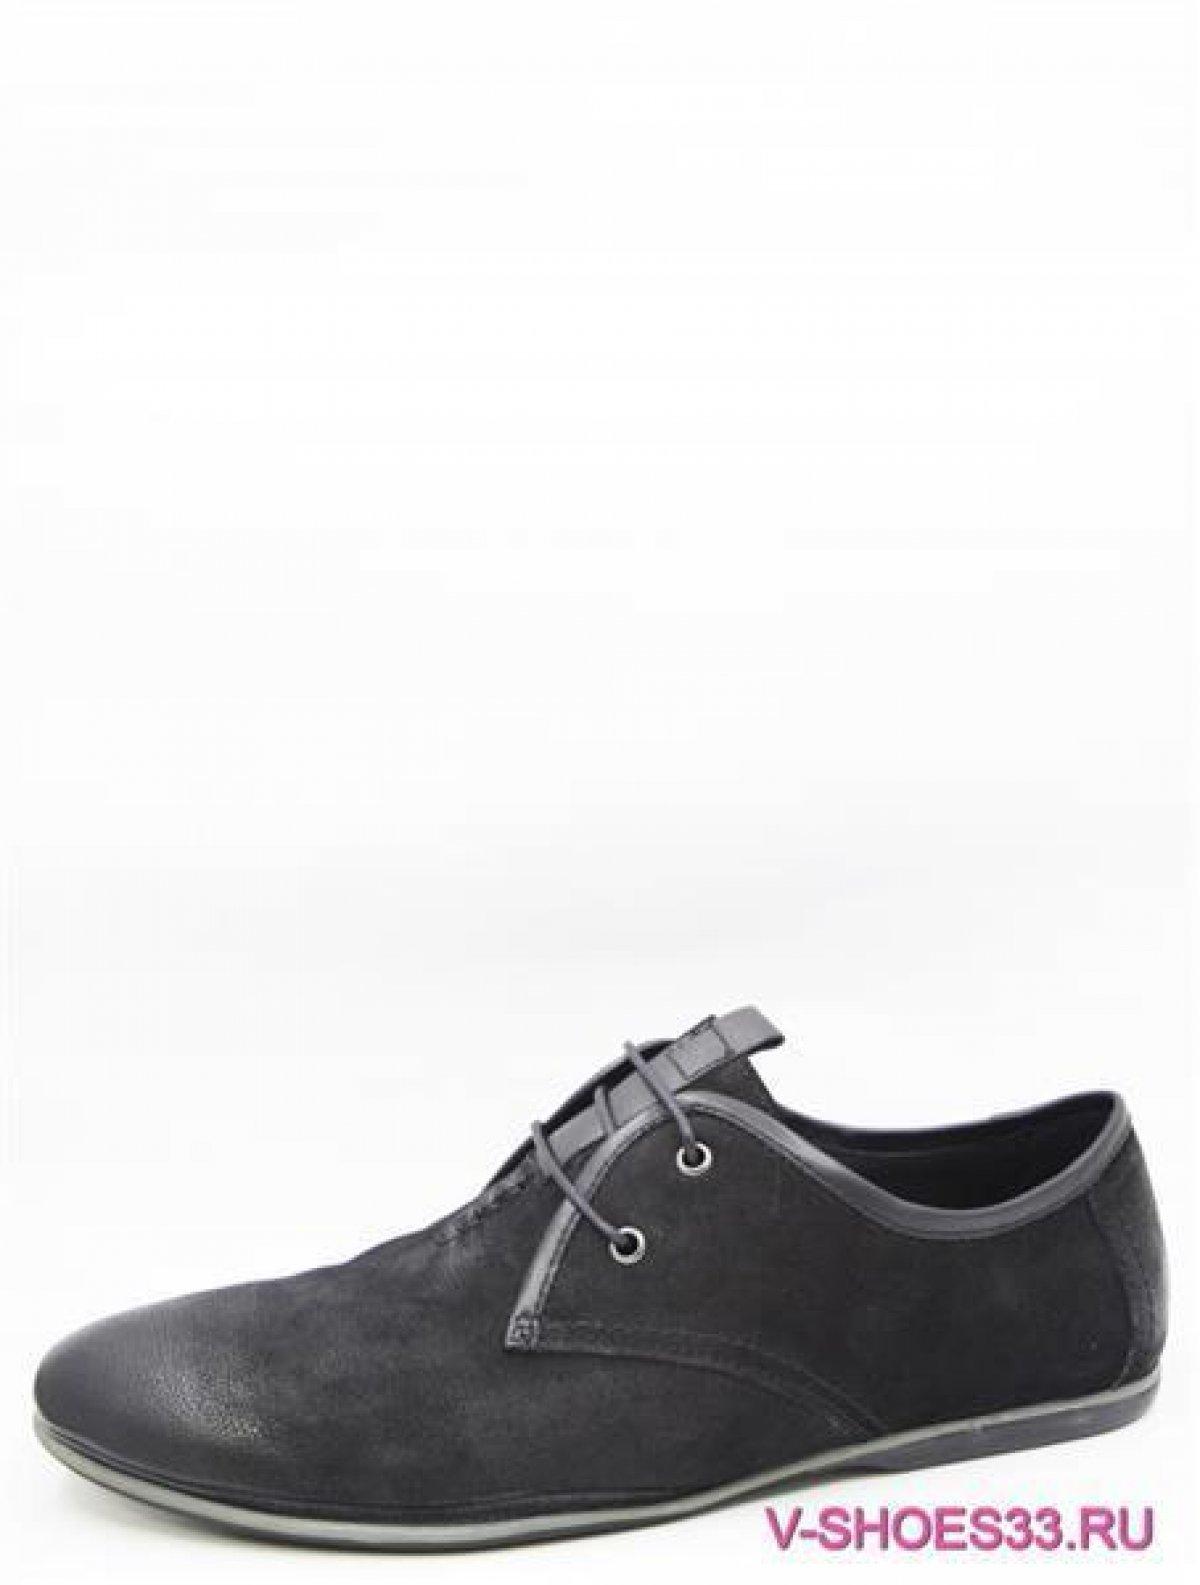 K83-075106 мужские туфли